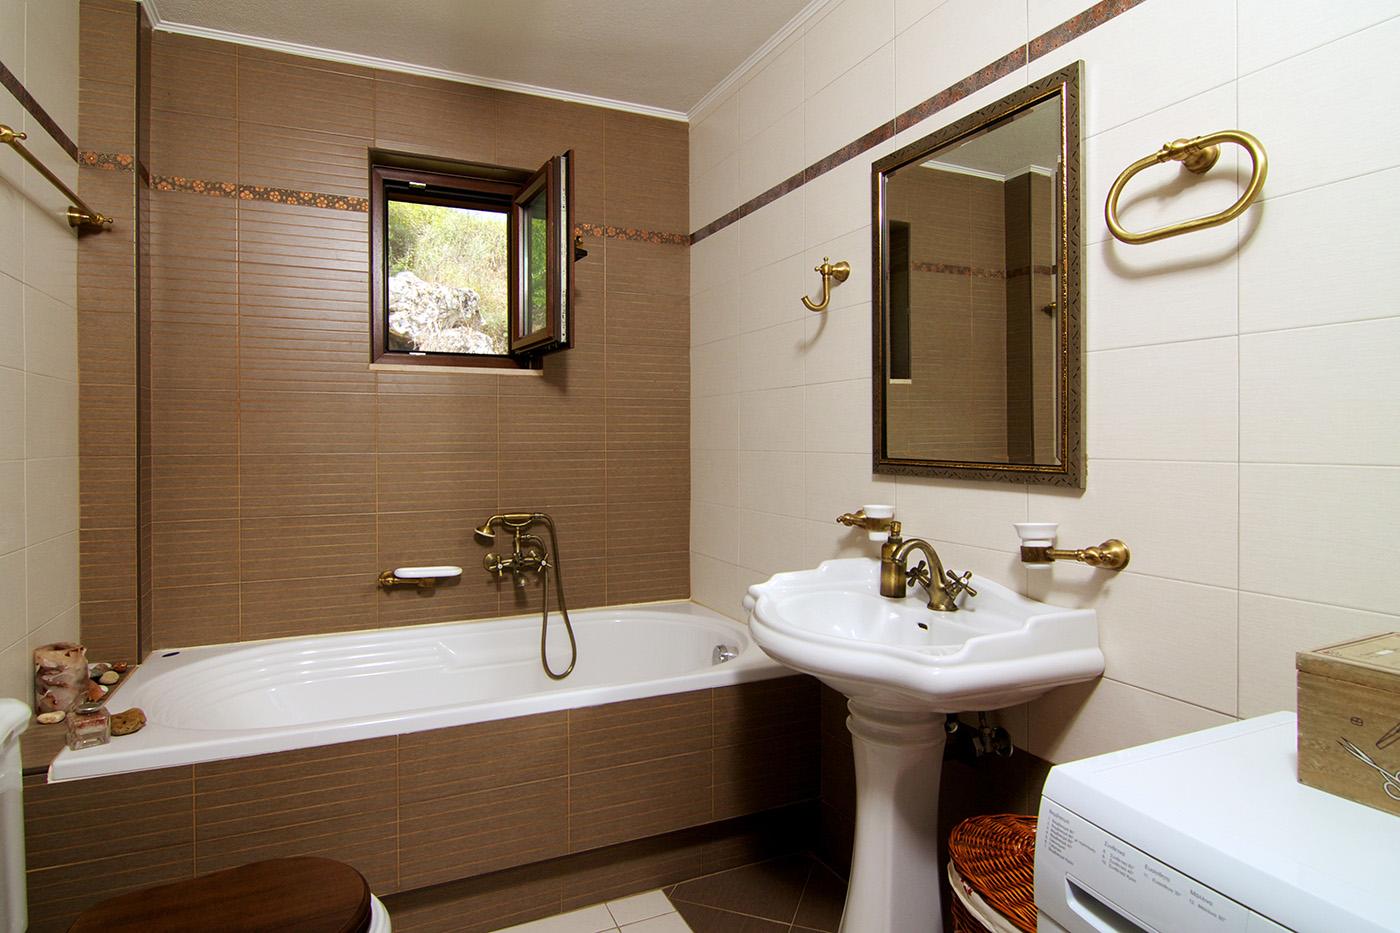 Rooms - Main Bathroom